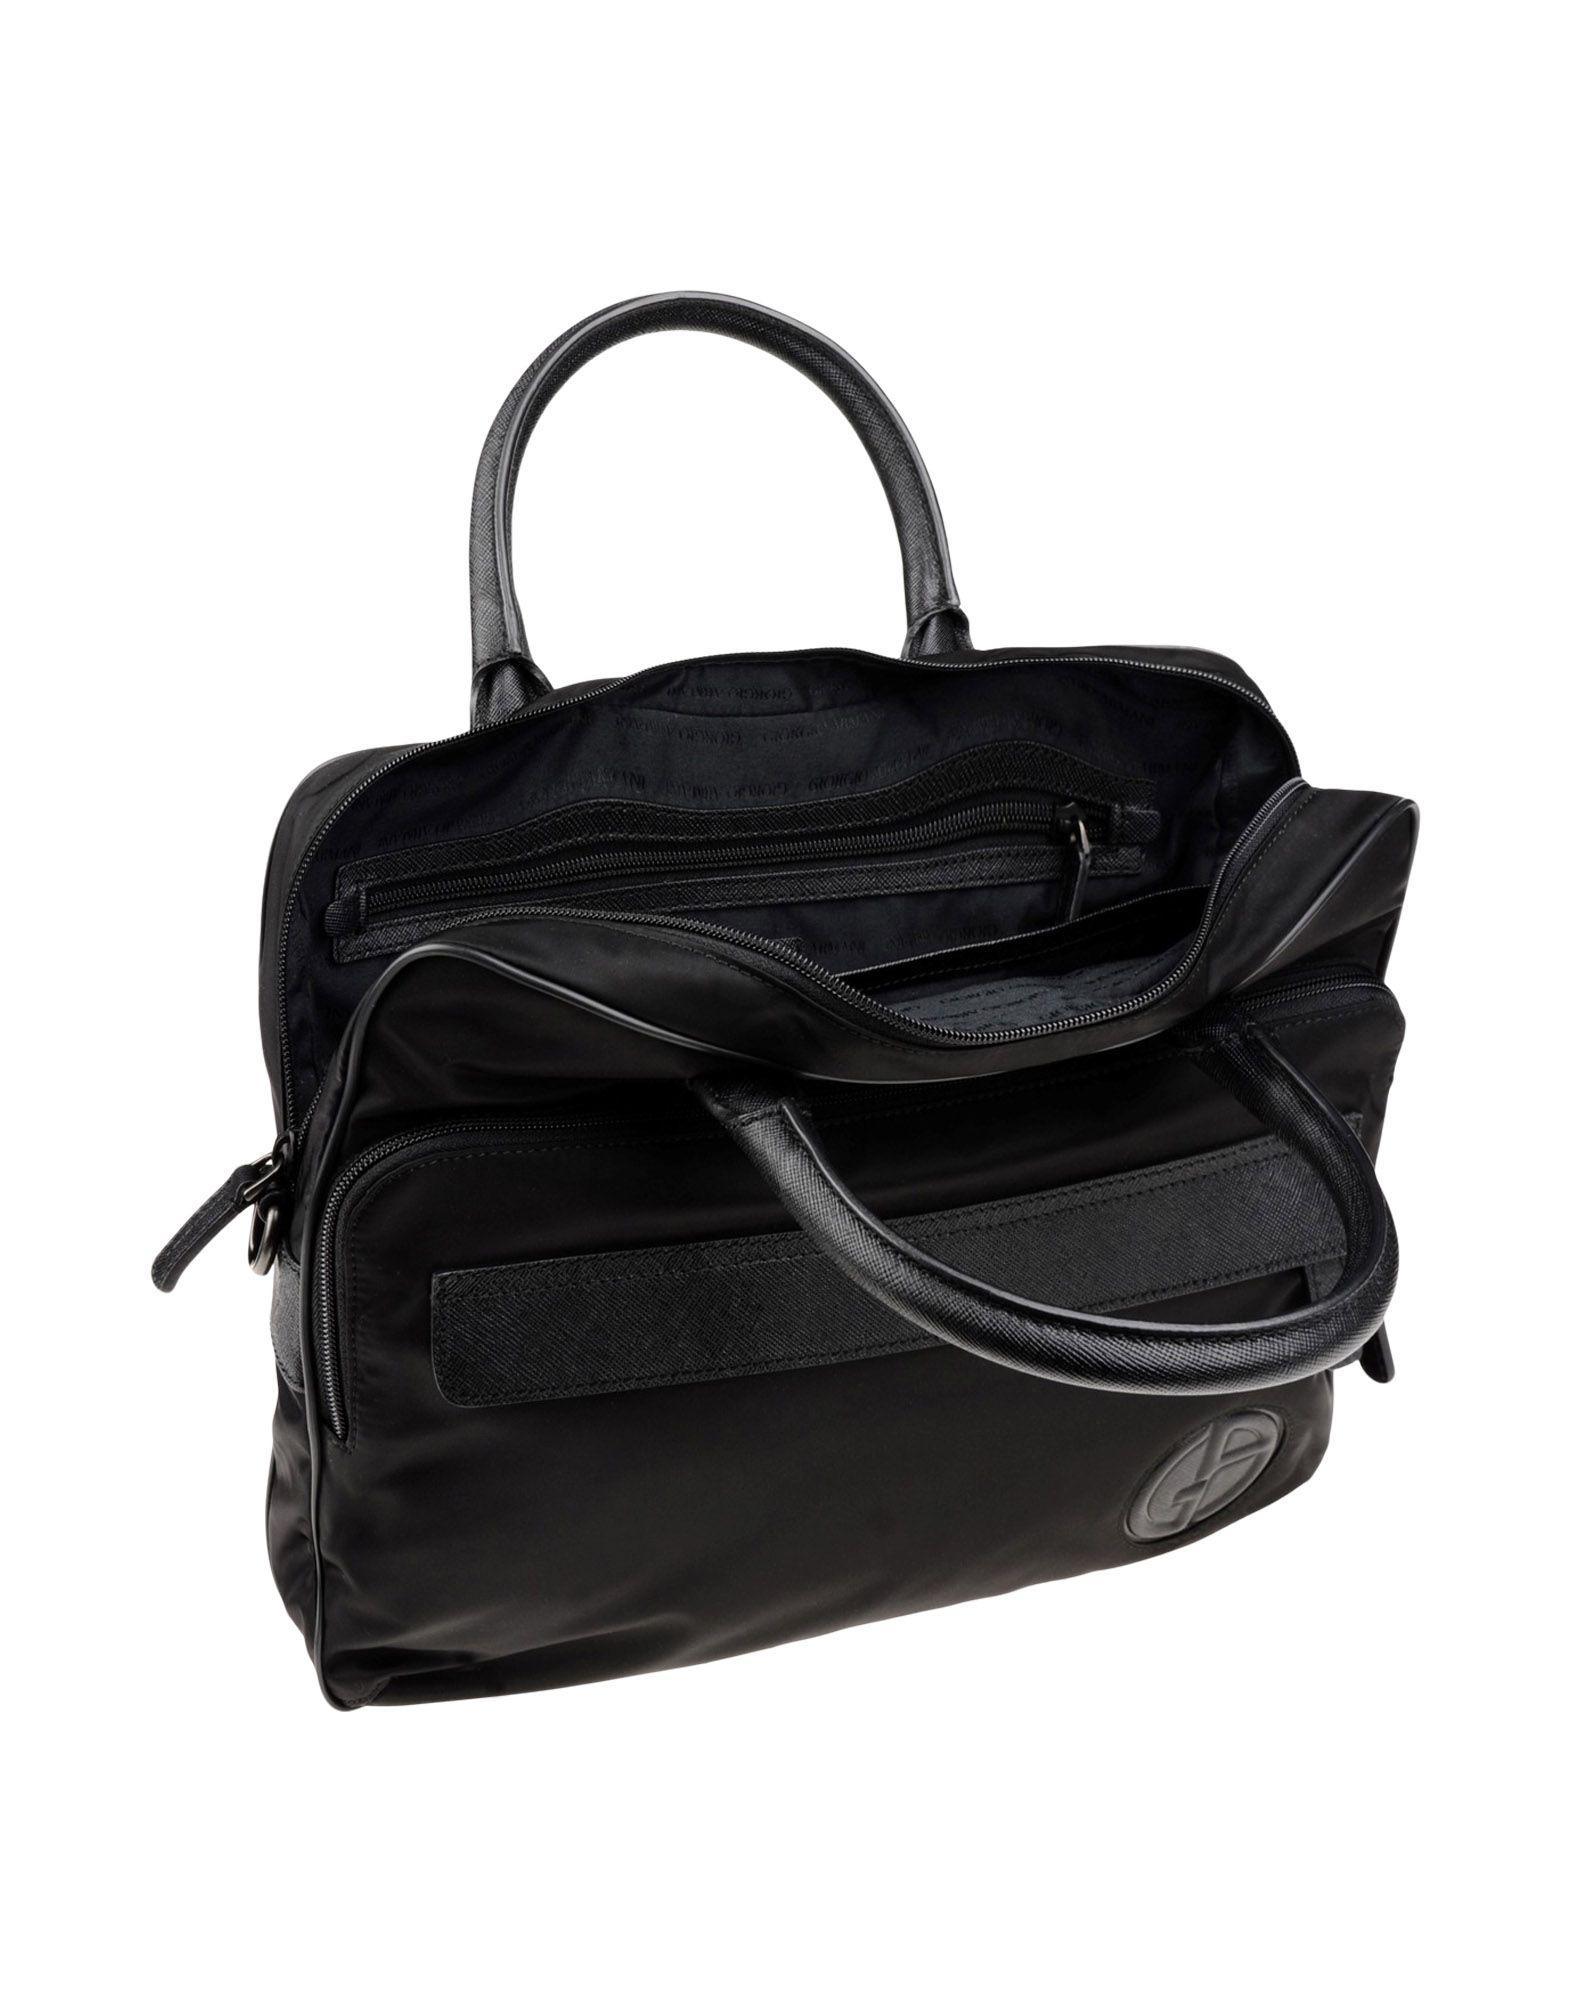 Armani LUGGAGE - Beauty cases su YOOX.COM idHgPPrM